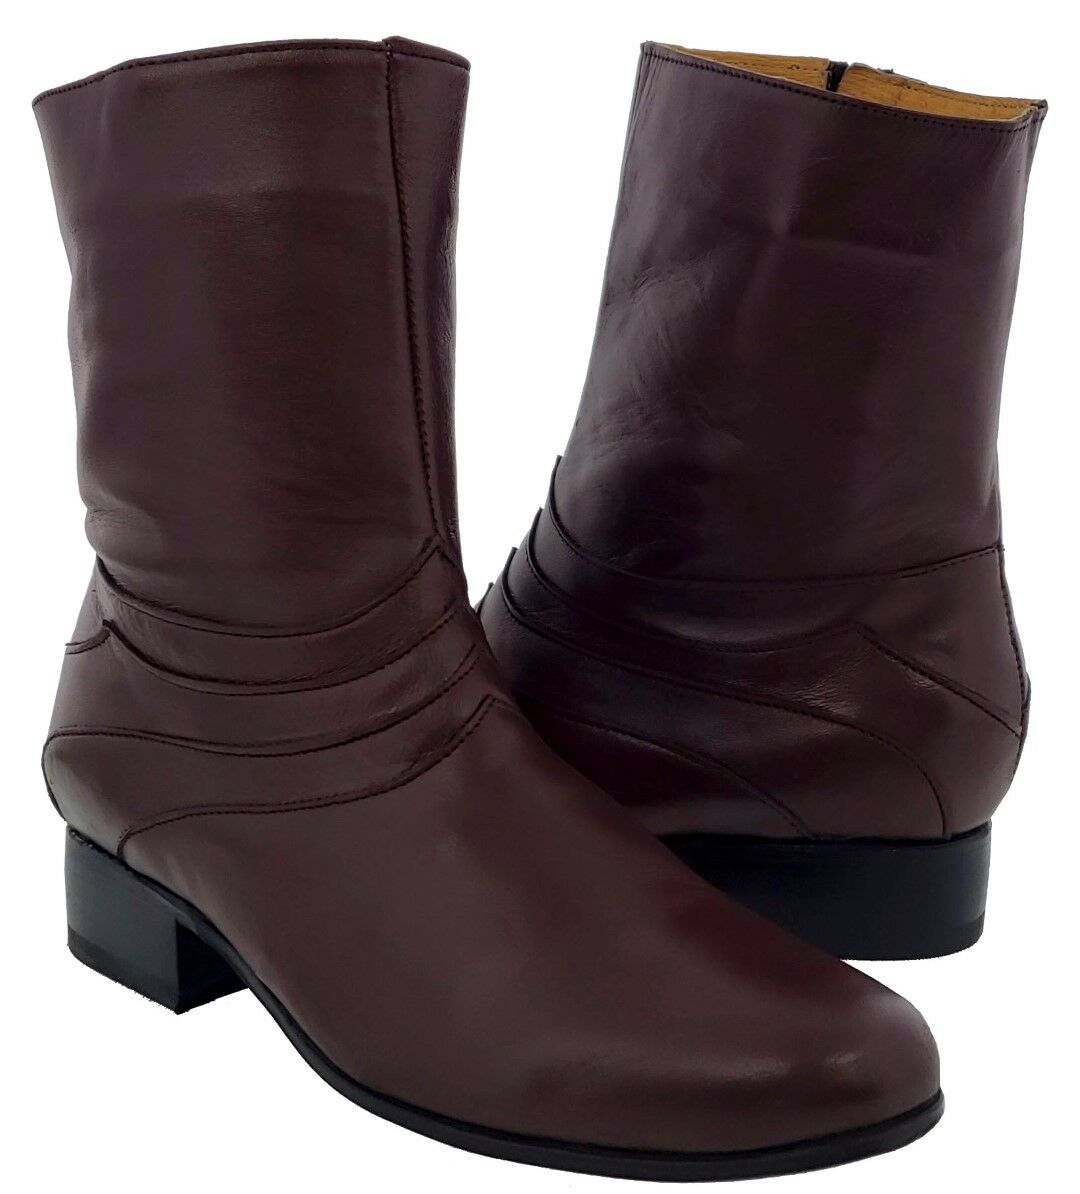 Uomo Burgundy Smooth Pelle Round Zipper Ankle Stivali Design Botin Cowboy Rodeo